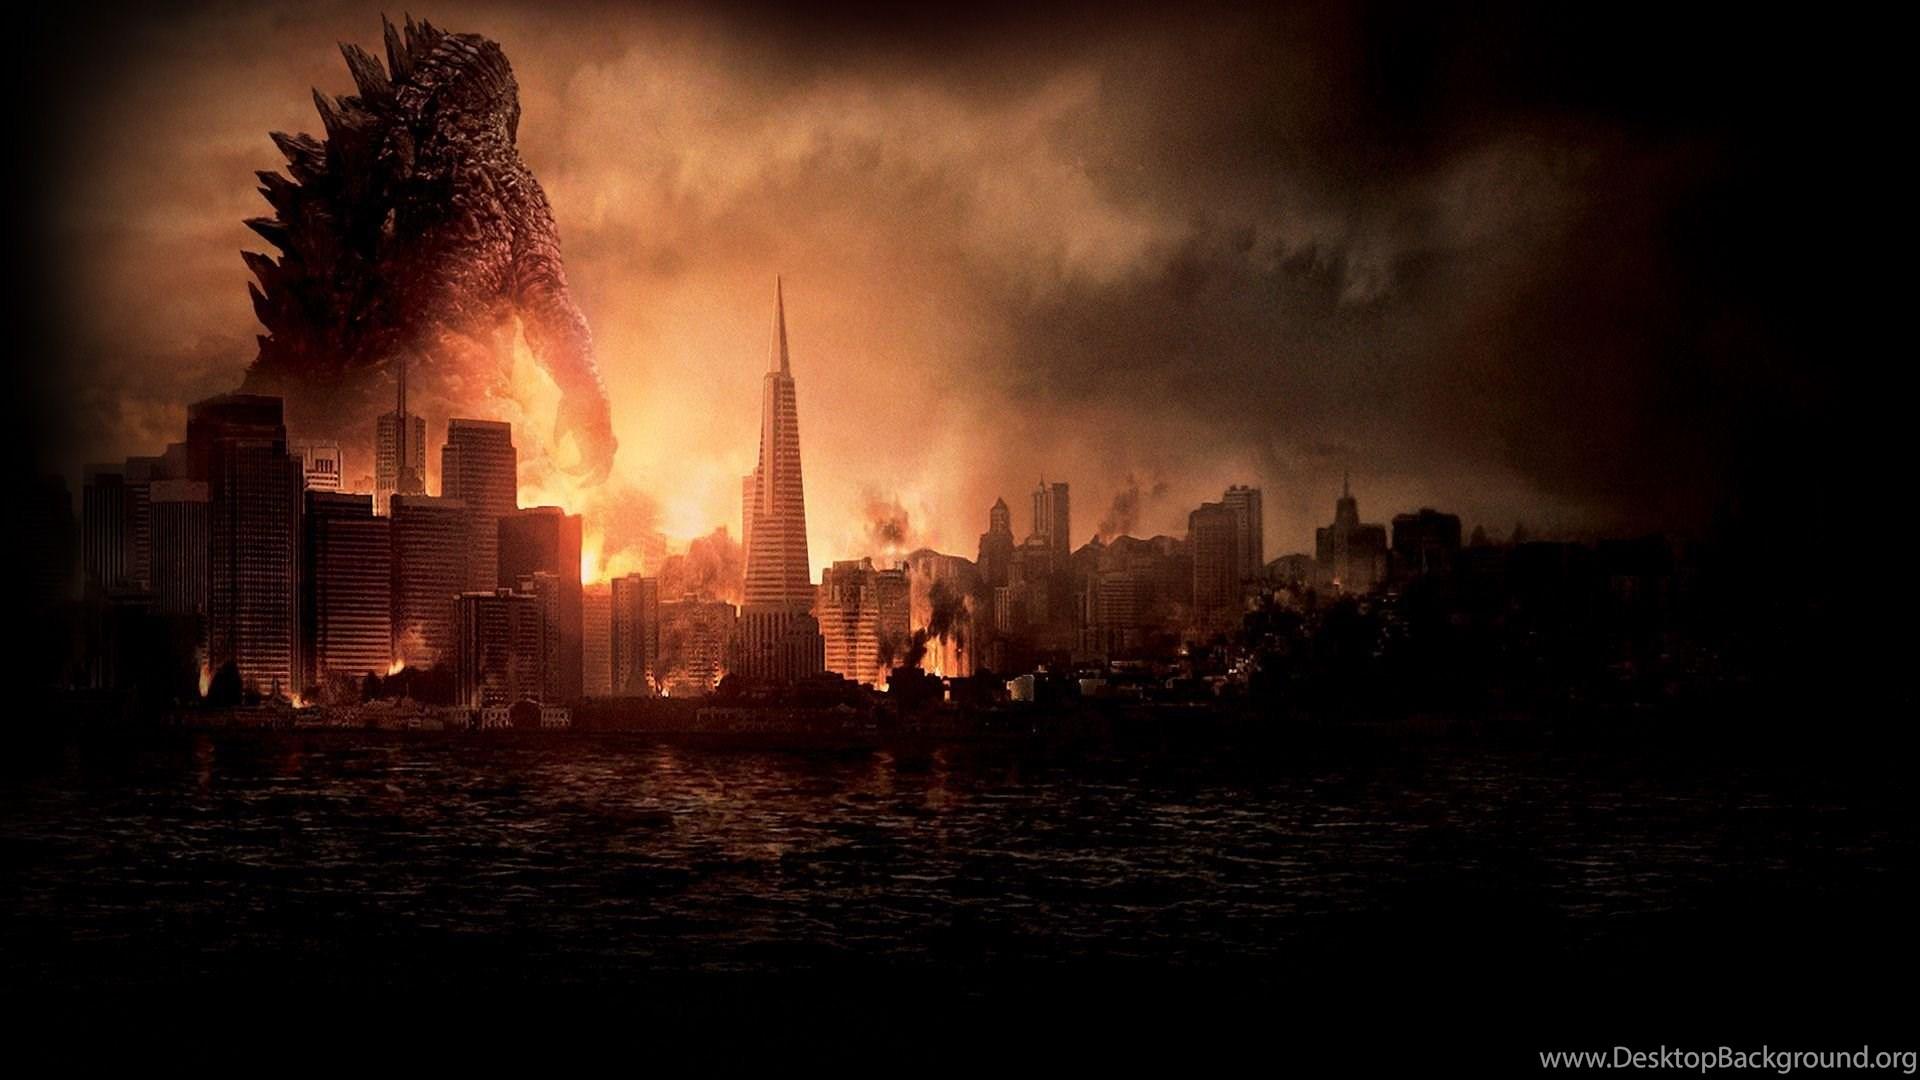 Godzilla movie poster creator desktop background - Movie poster wallpaper ...